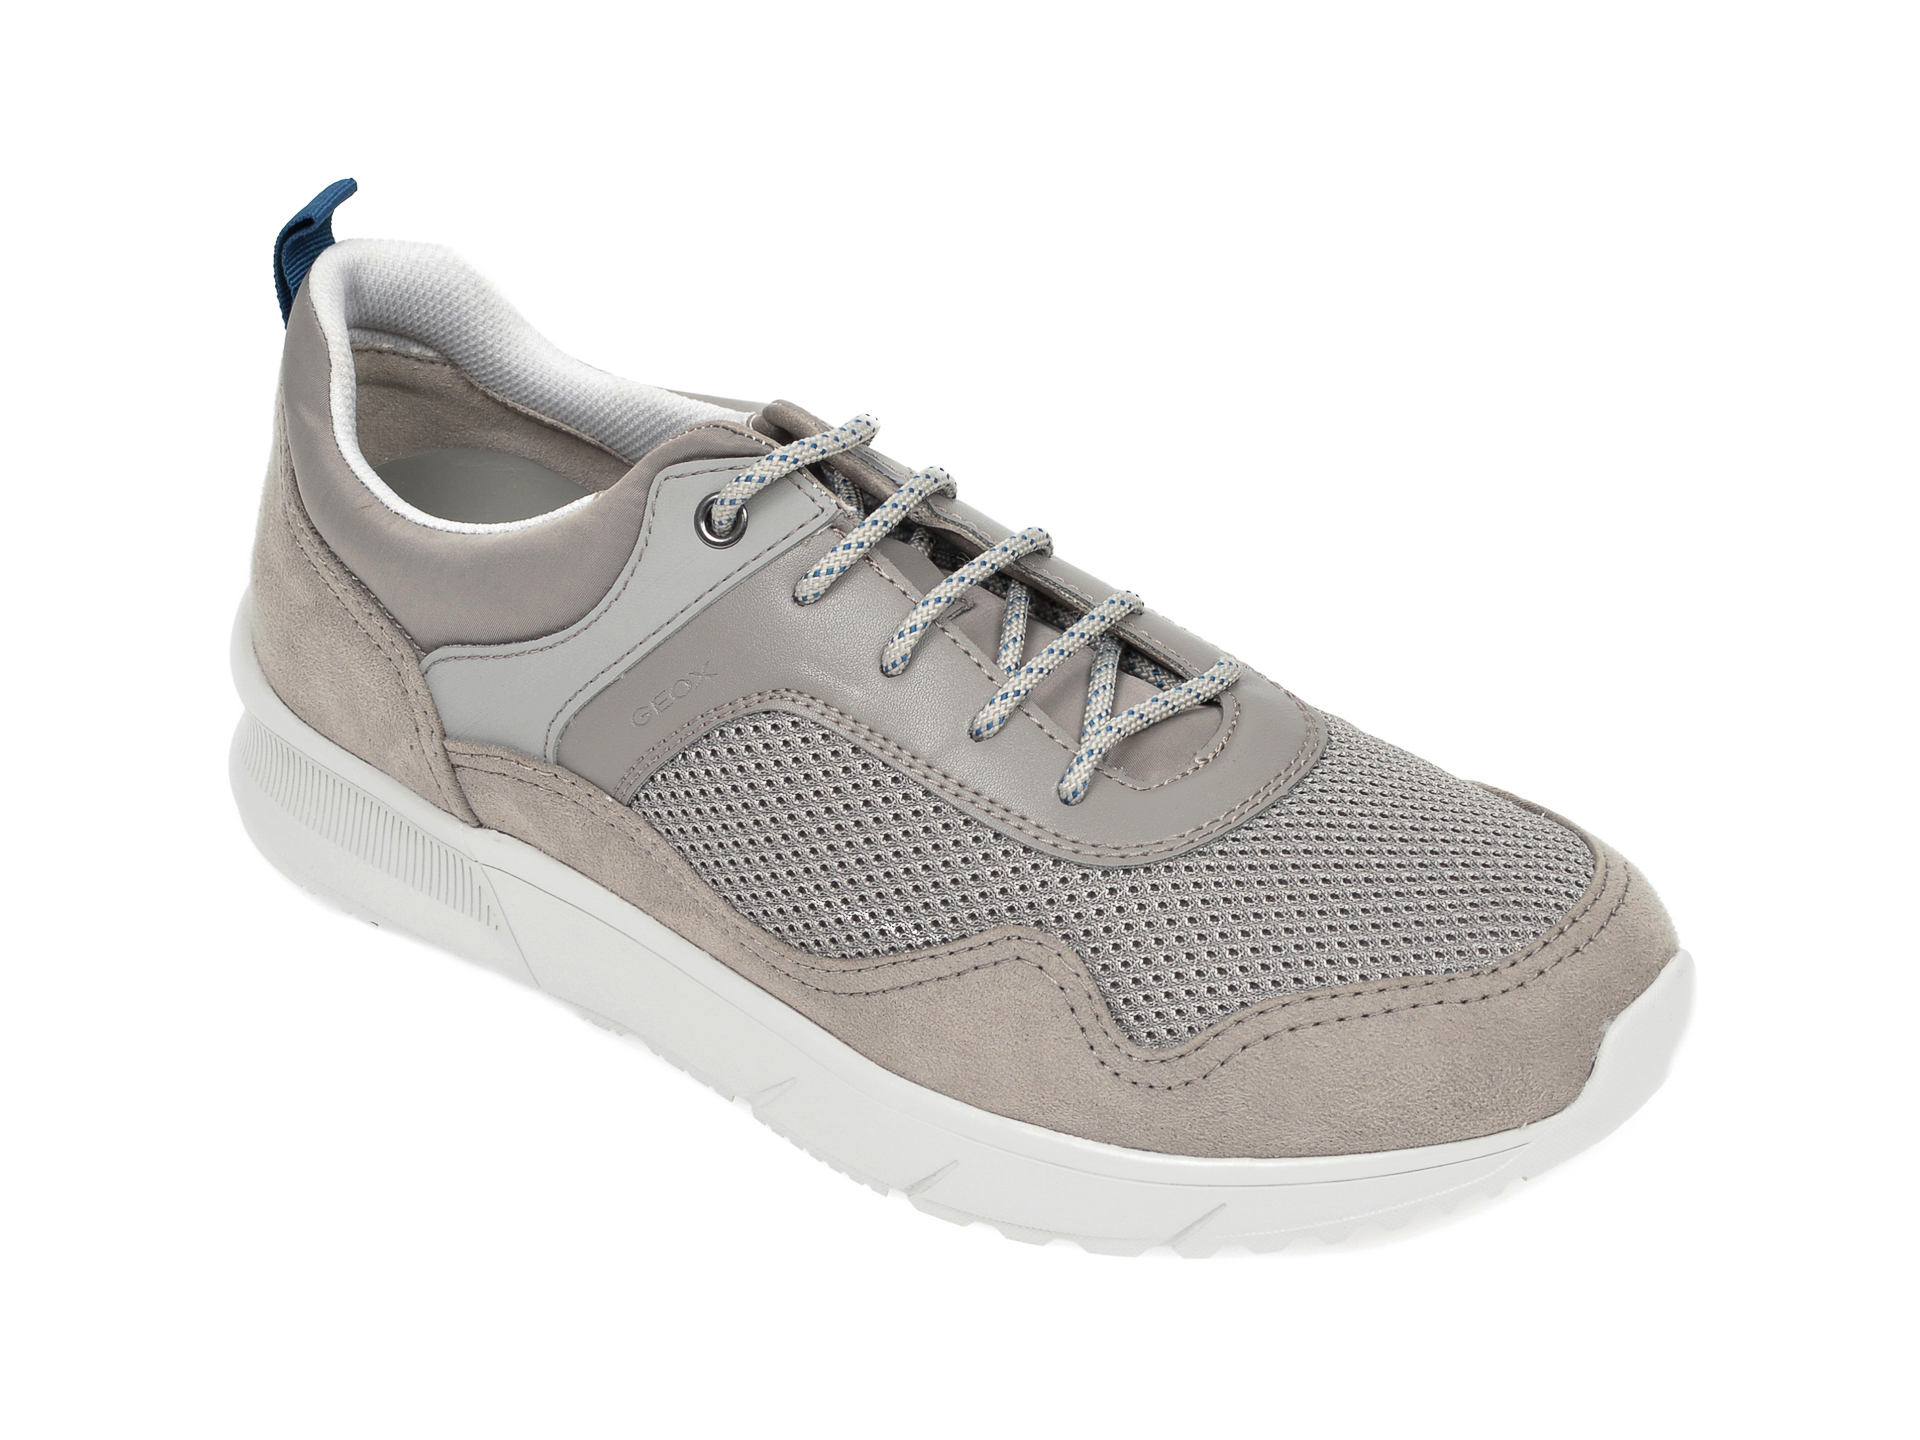 Pantofi sport GEOX gri, U029UB, din material textil si piele ecologica imagine